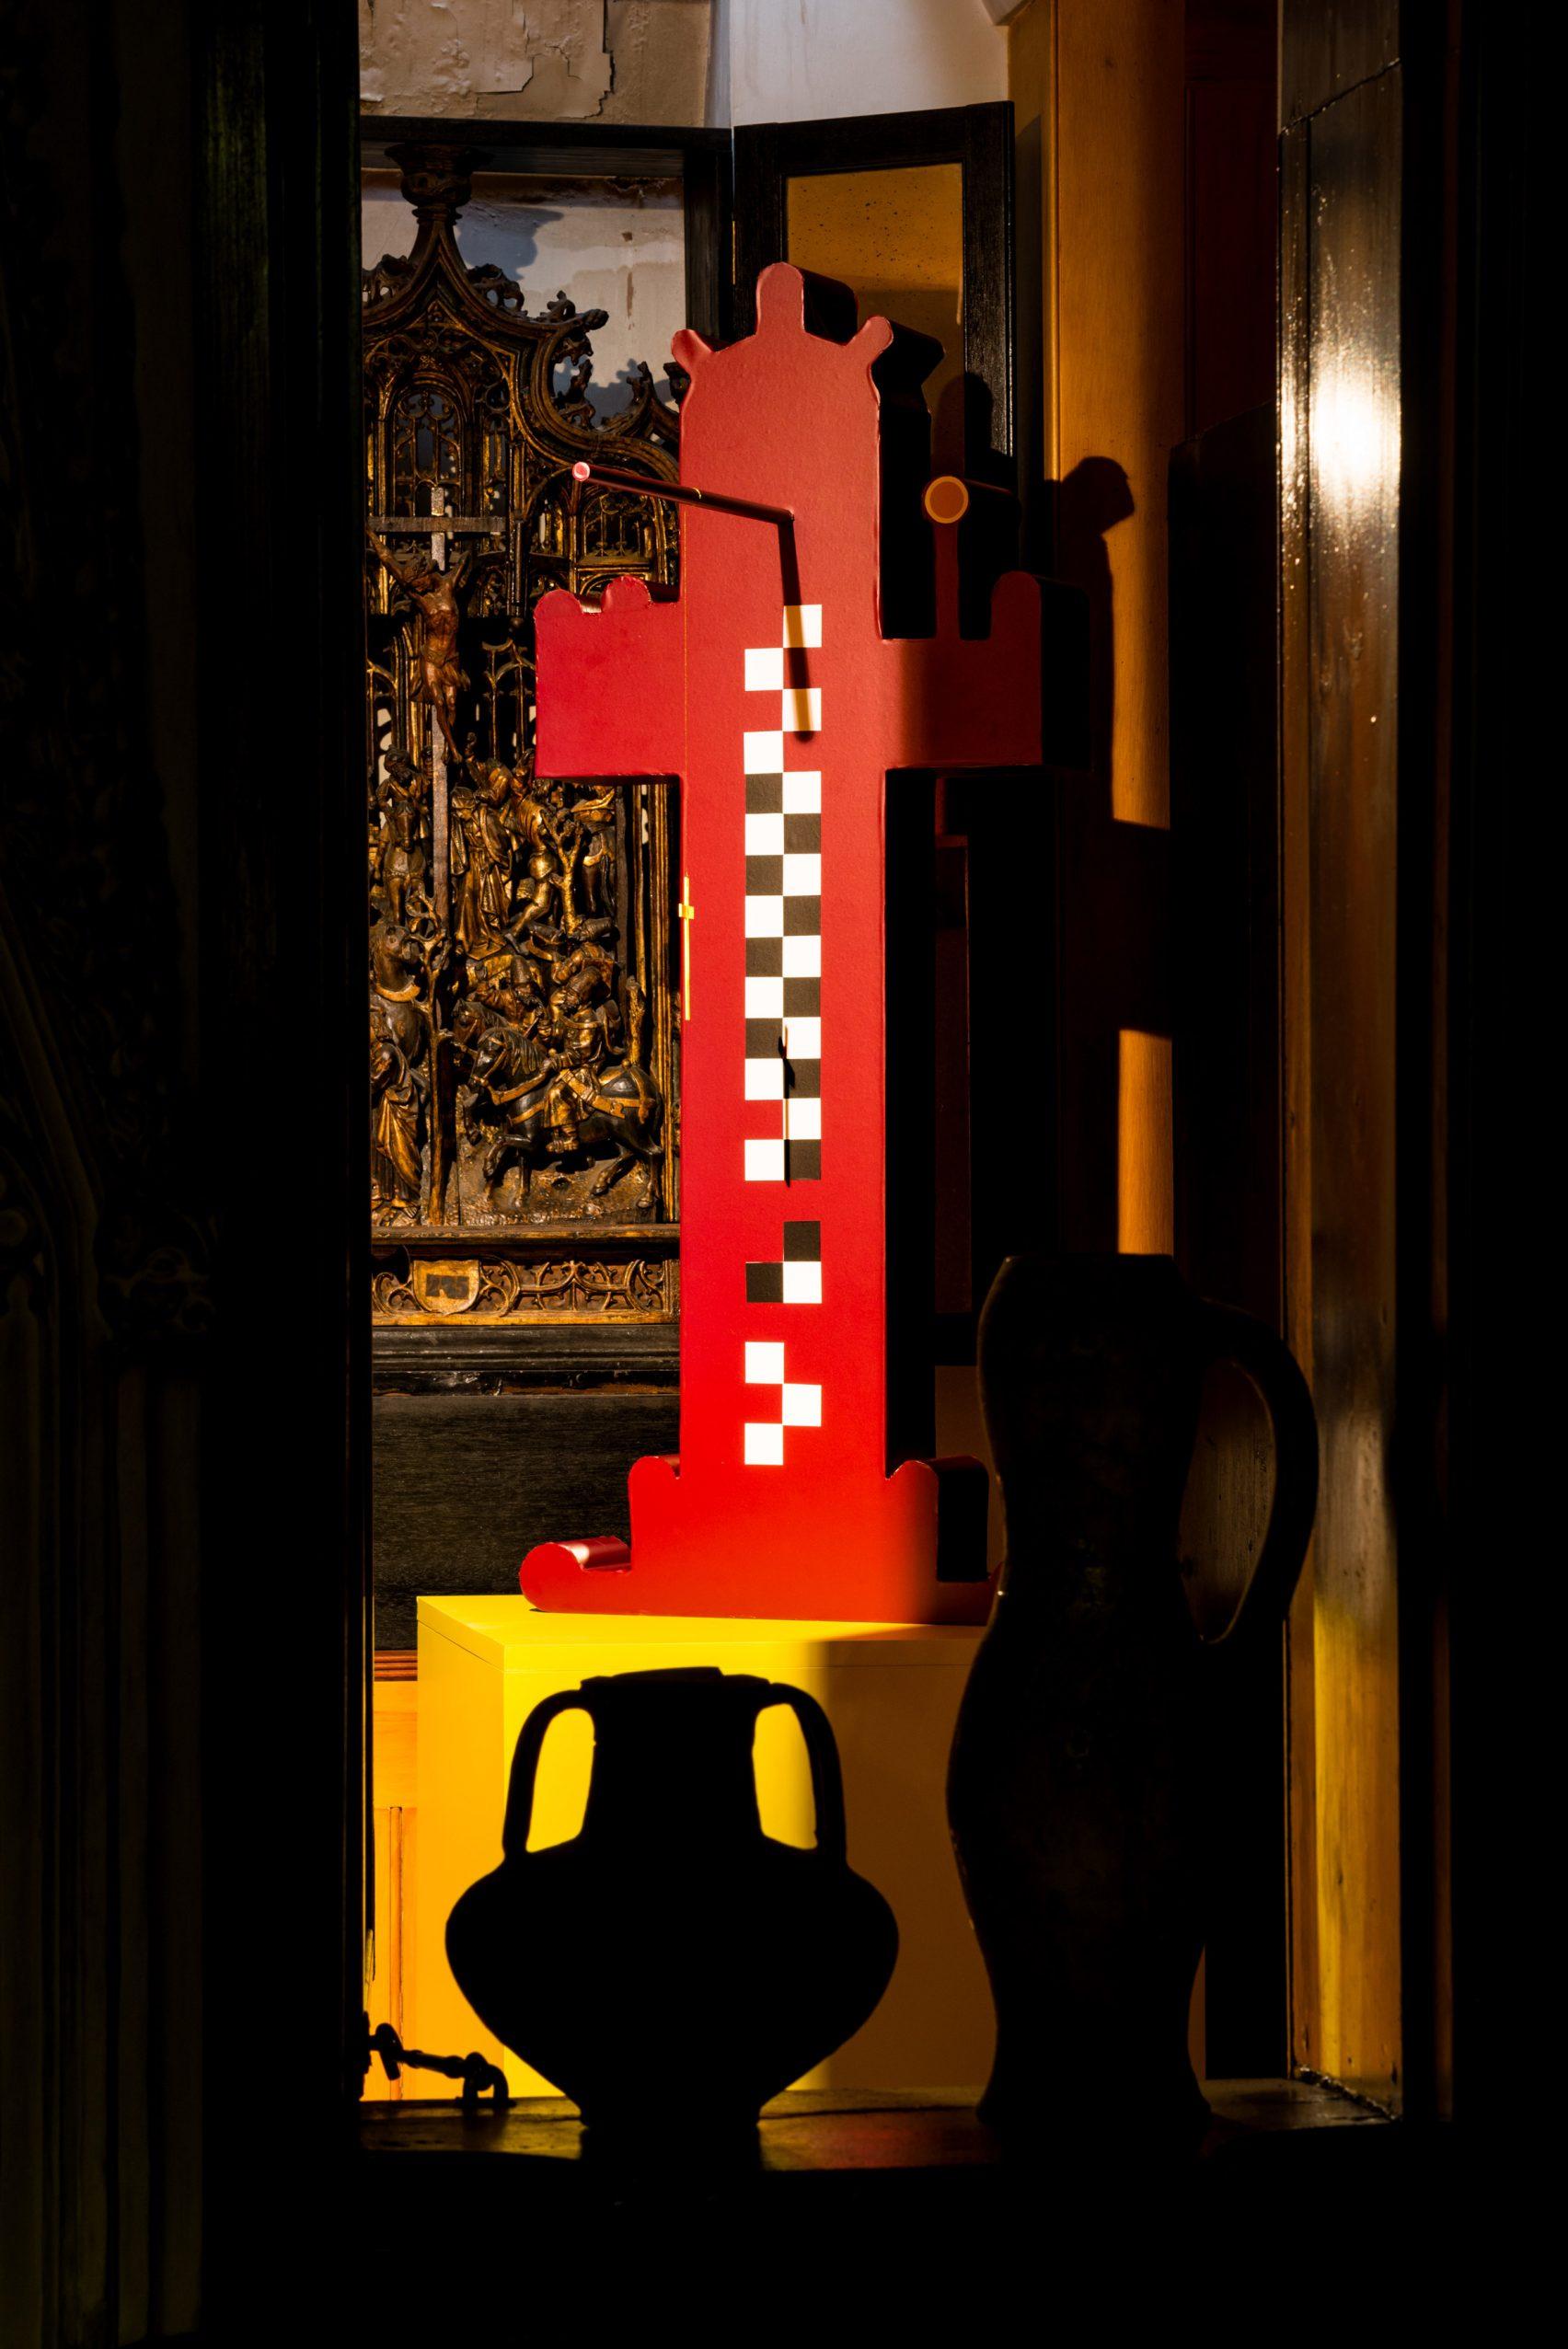 john-soane-architectural-characters-installation-london-uk_dezeen_2364_col_12-1704x2553.jpg